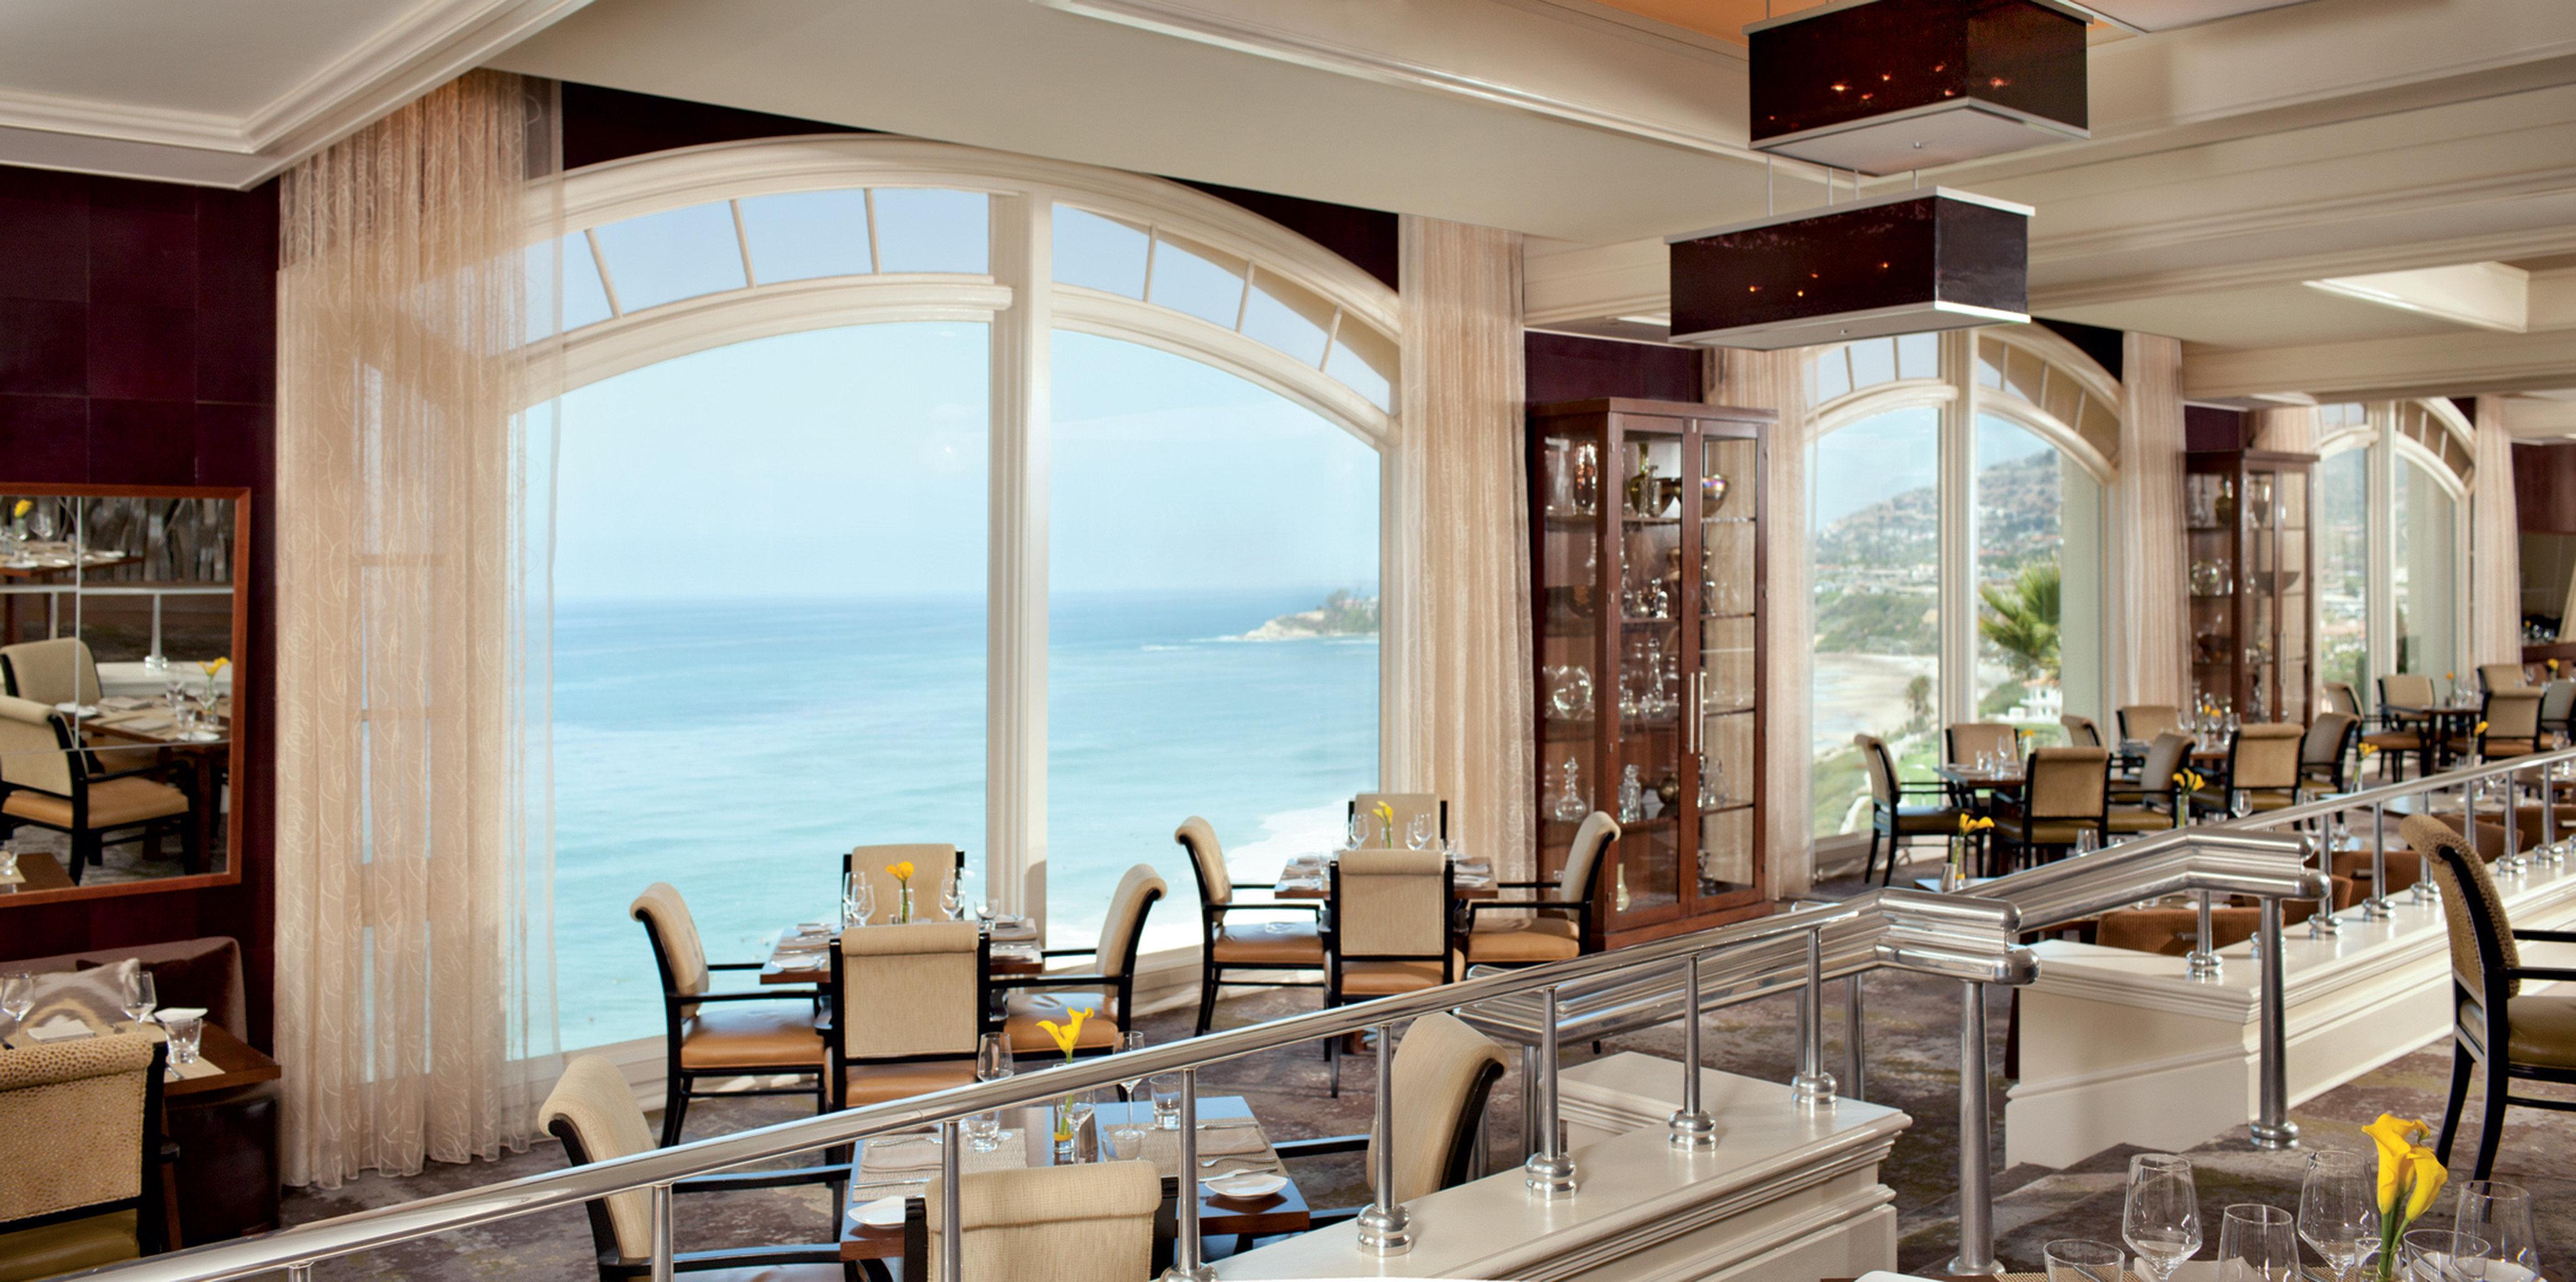 Bar Dining Drink Eat Elegant Modern Scenic views chair property restaurant home Resort mansion Villa overlooking condominium Island